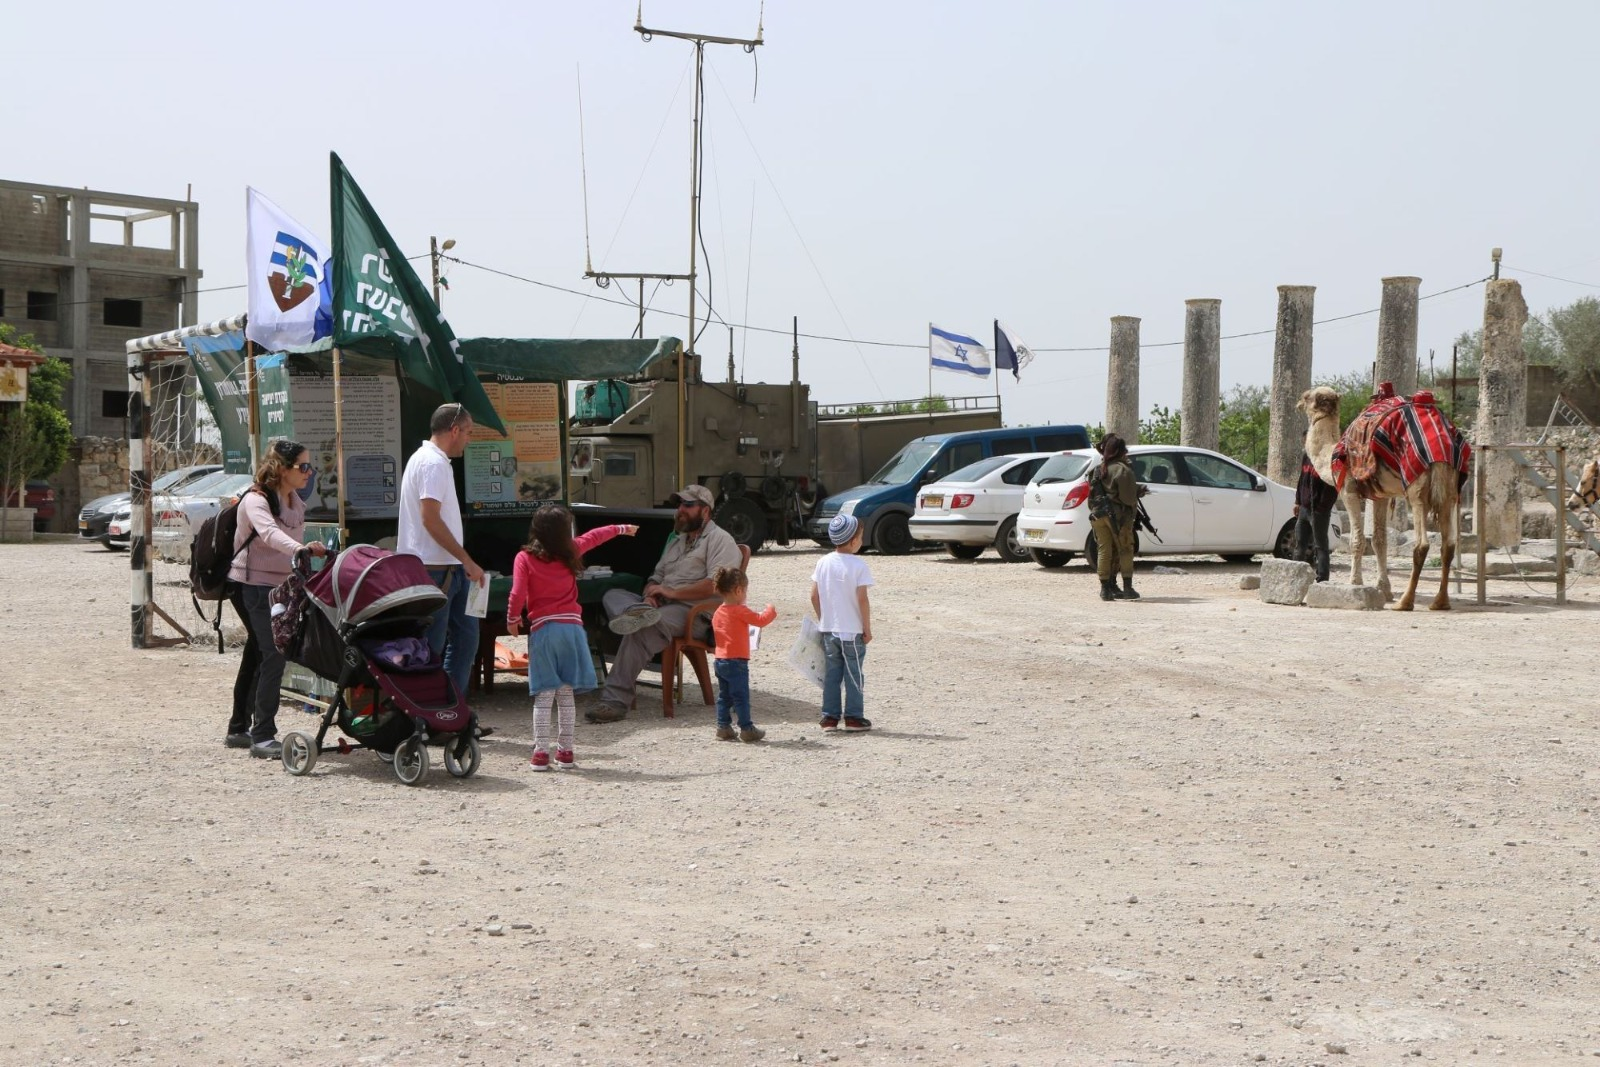 Israeli settlers visit the public plaza of Sebastia, West Bank, escorted by the Israeli army on a Jewish holiday, April 12, 2017. (Ahmad al-Bazz/Activestills)